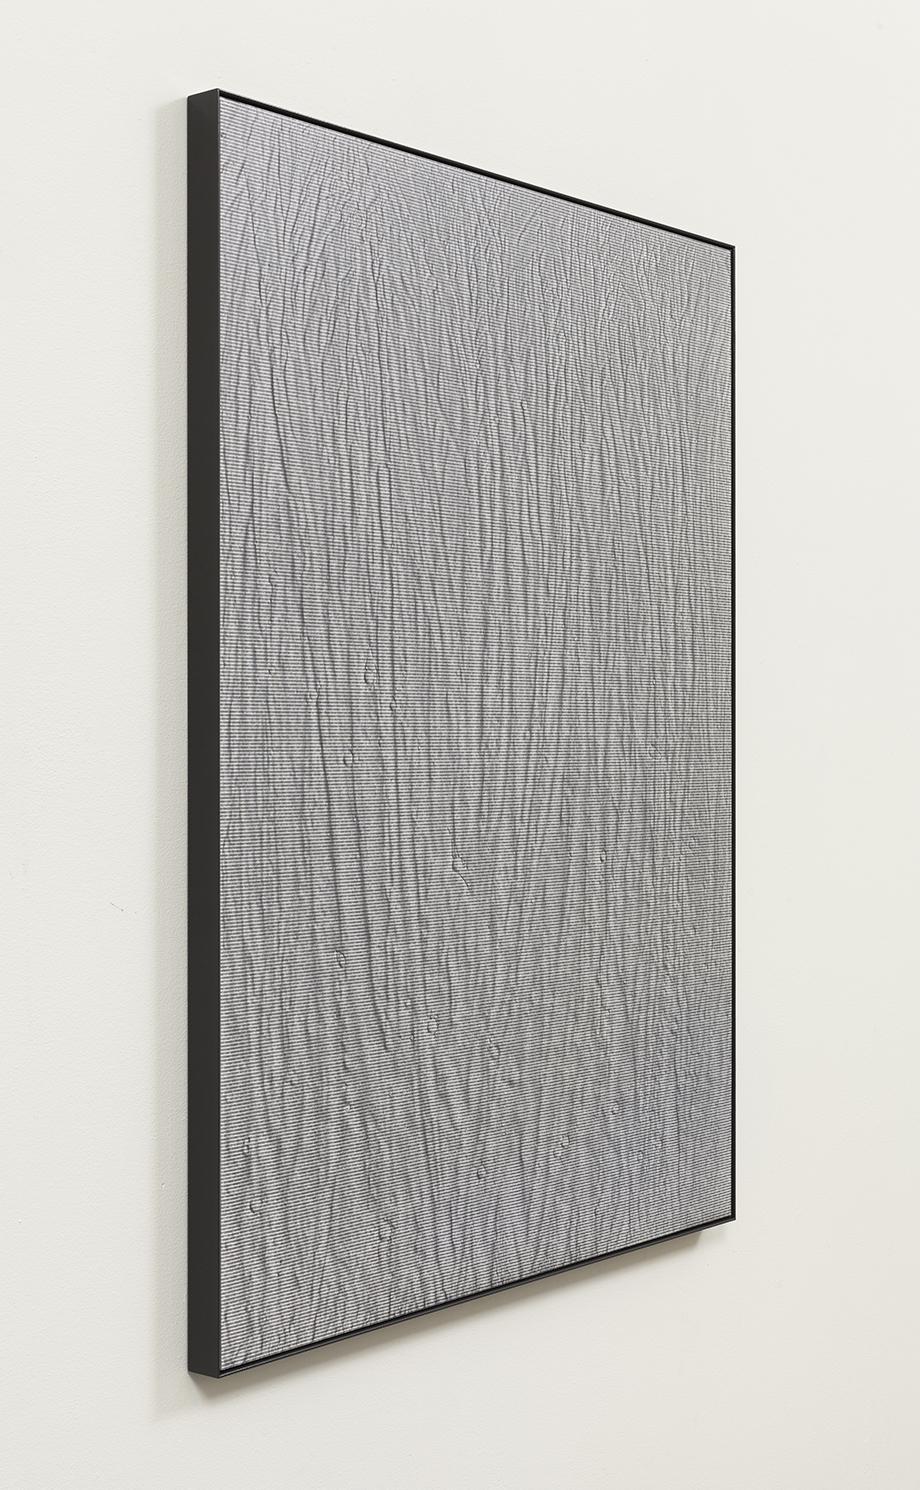 Michael Staniak, Steve Turner Contemporary, Los Angeles, Contemporary Art, Artbo